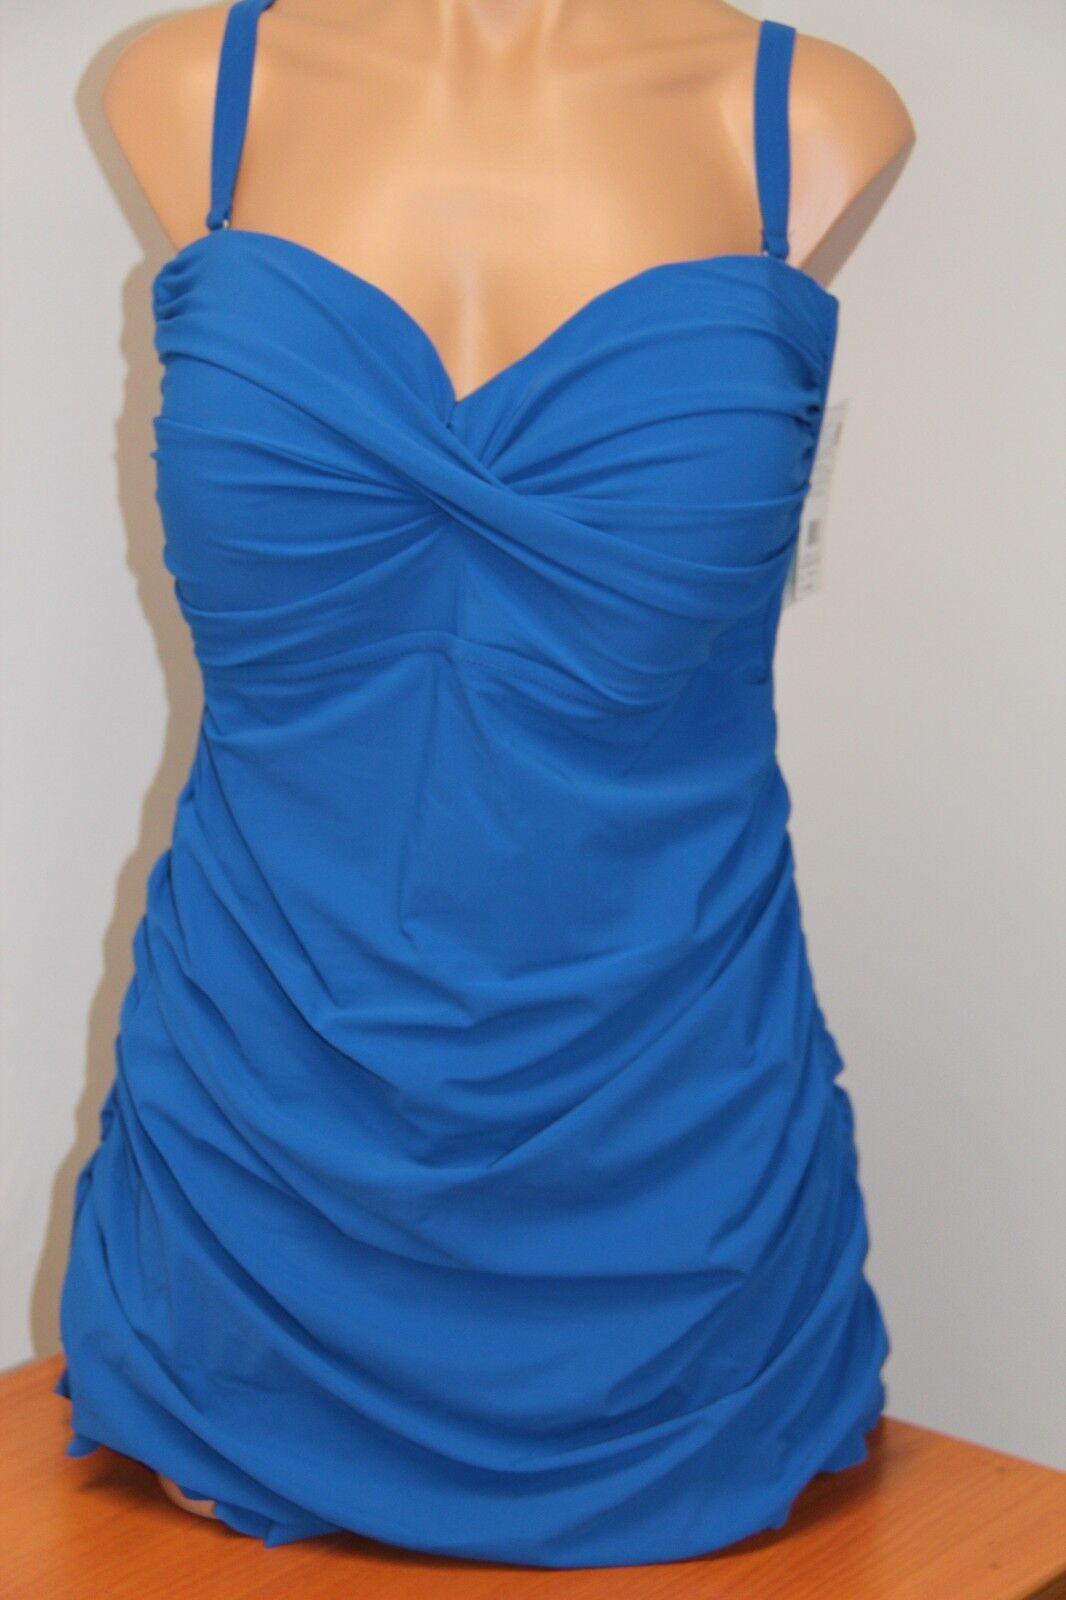 Profile by Gottex Swimsuit 1 one piece attached Dress Plus Sz 22W Ocean bluee